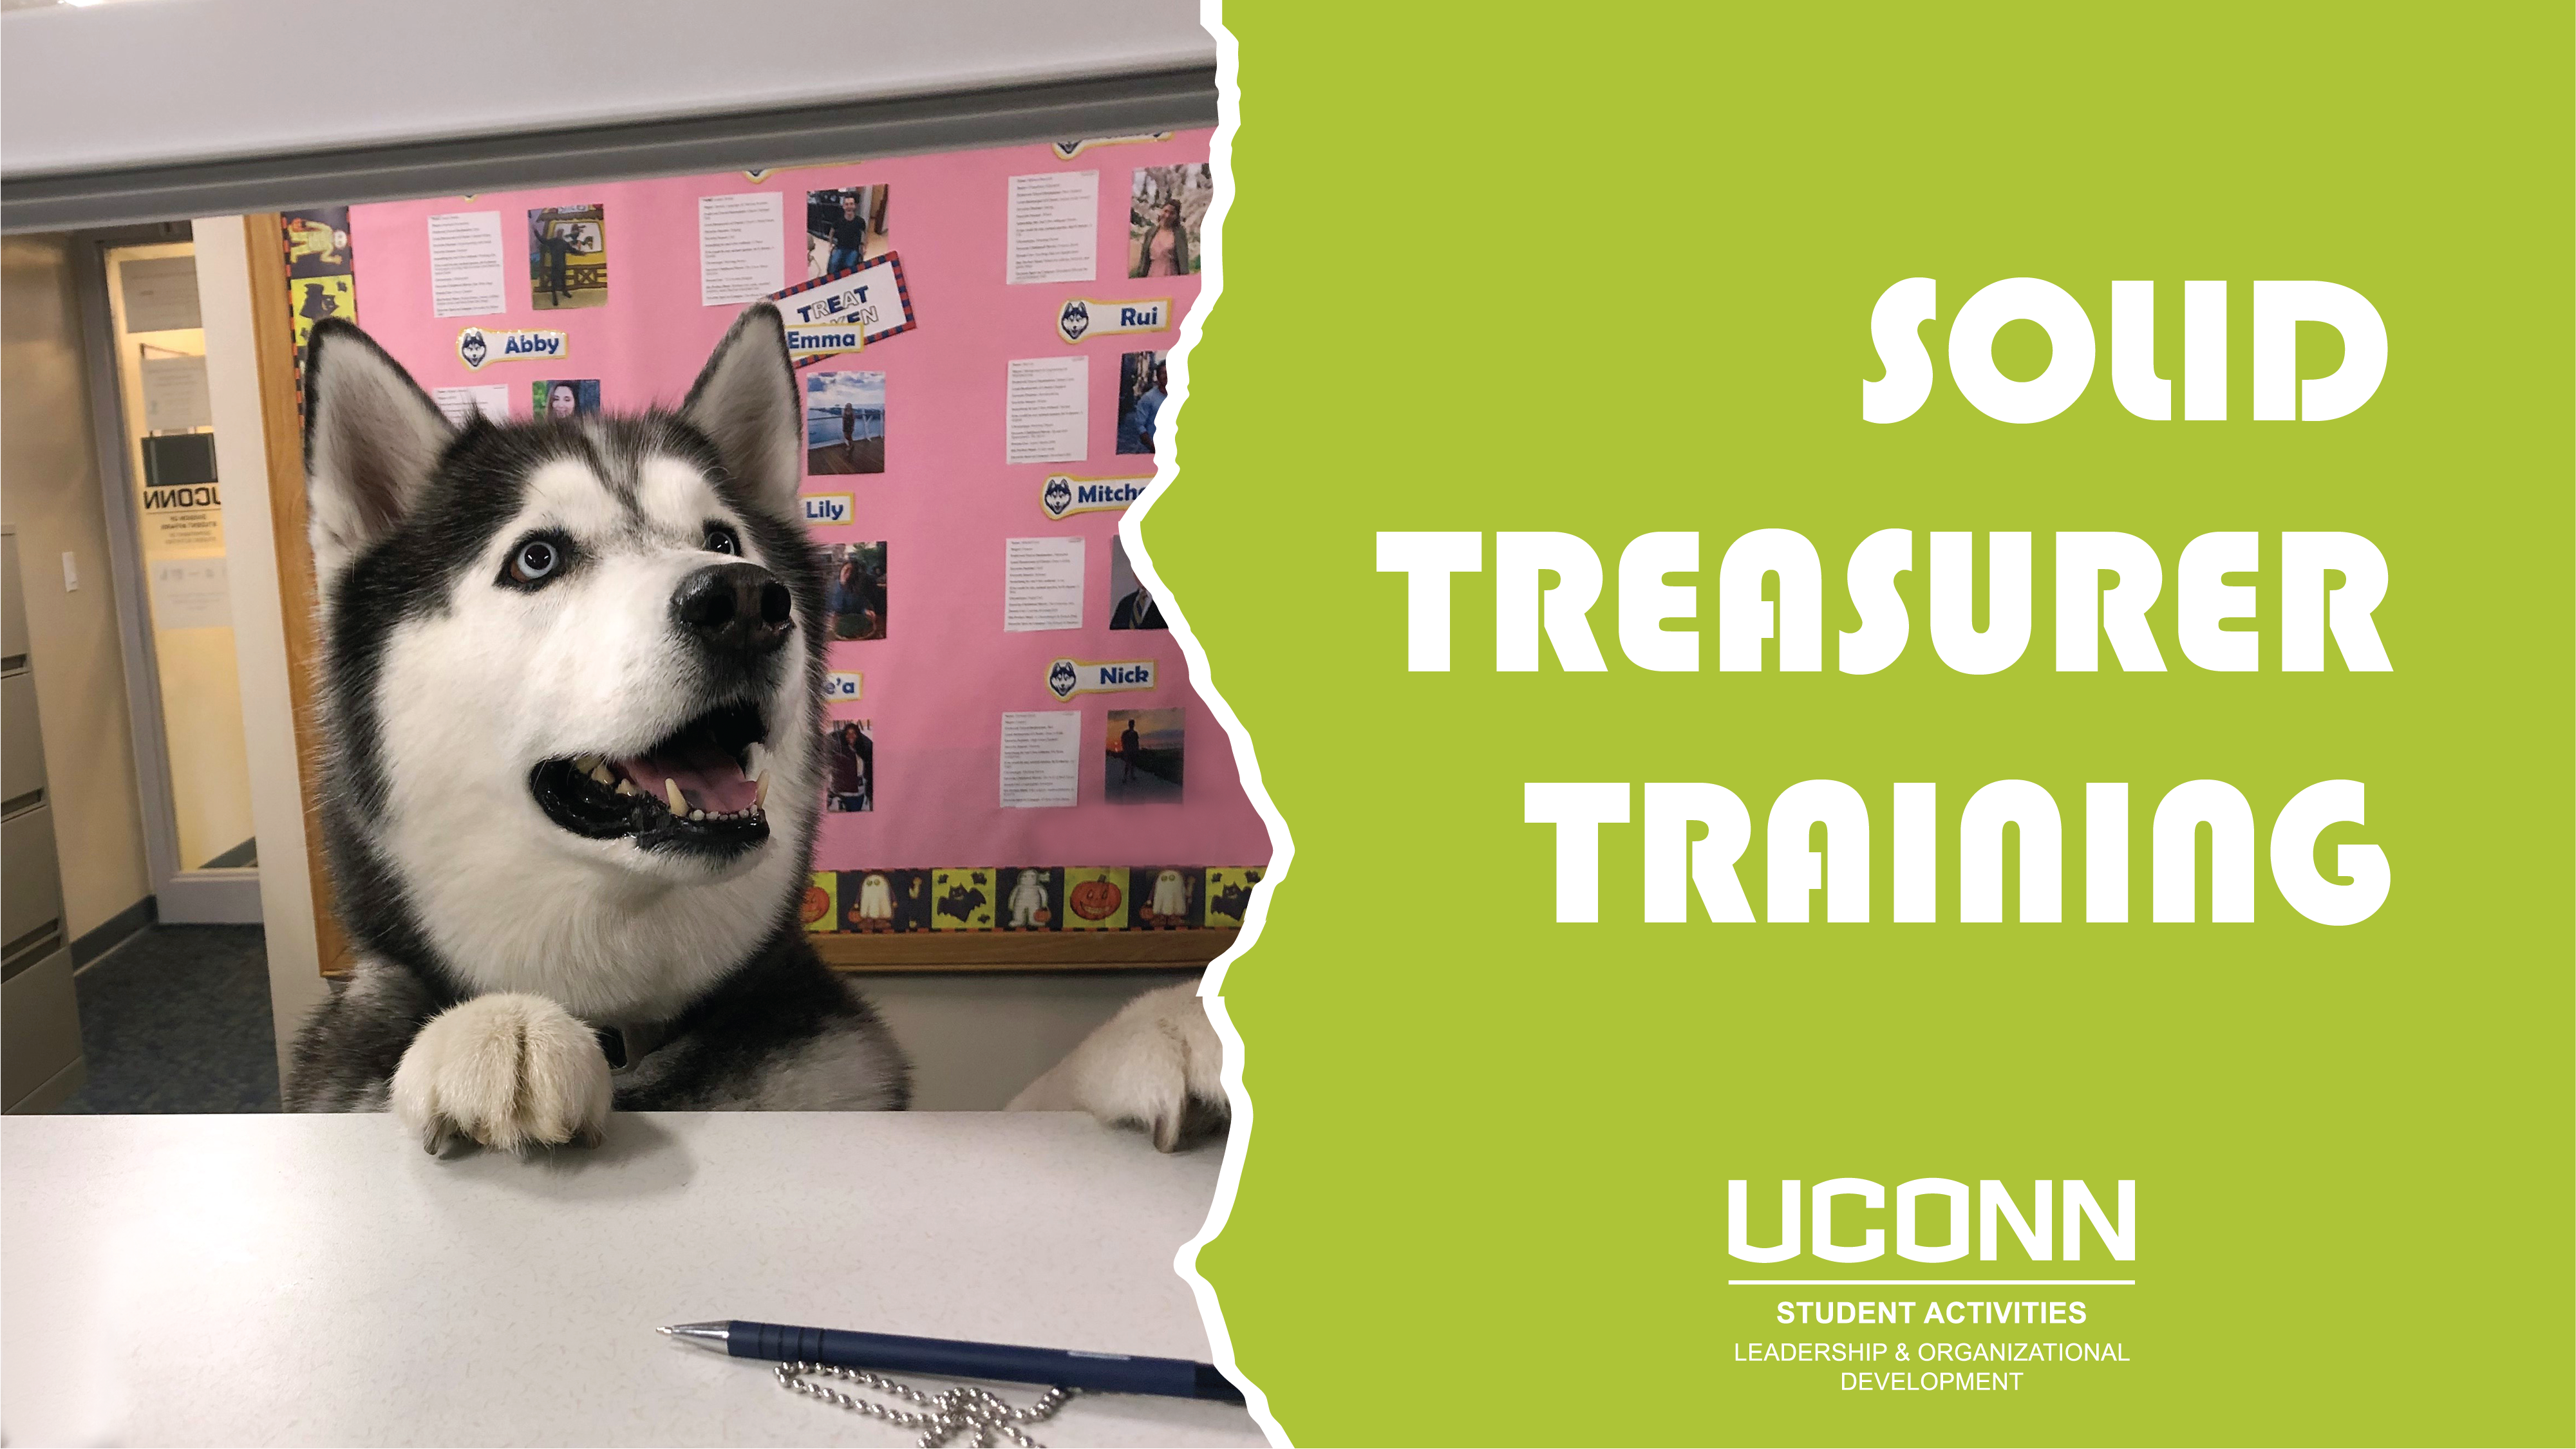 SOLID Treasurer Training